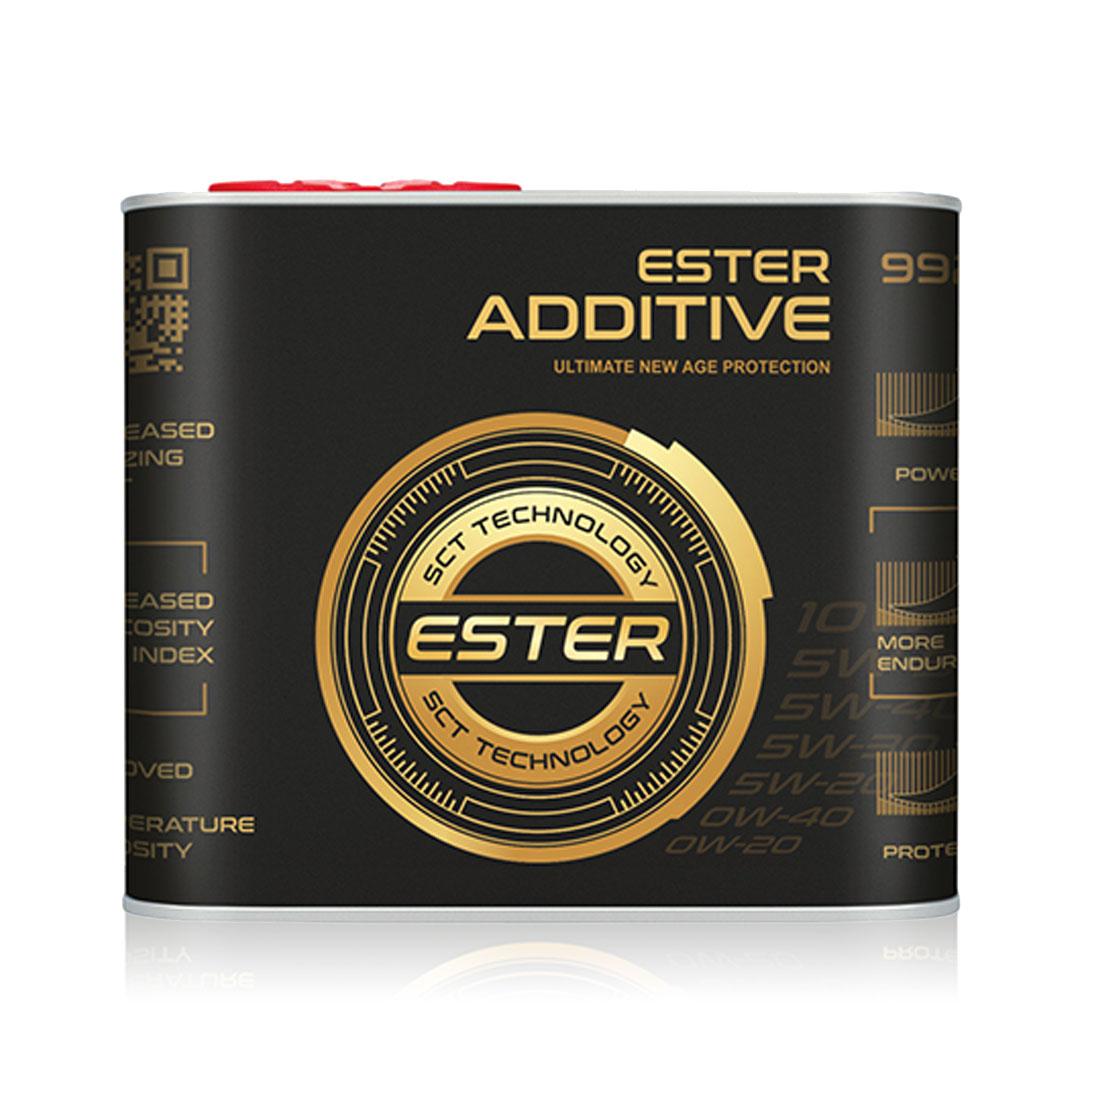 Ester Additiv MANNOL 500 ml Motoröladditiv Motoröl Zusatz Motorschutz 9929